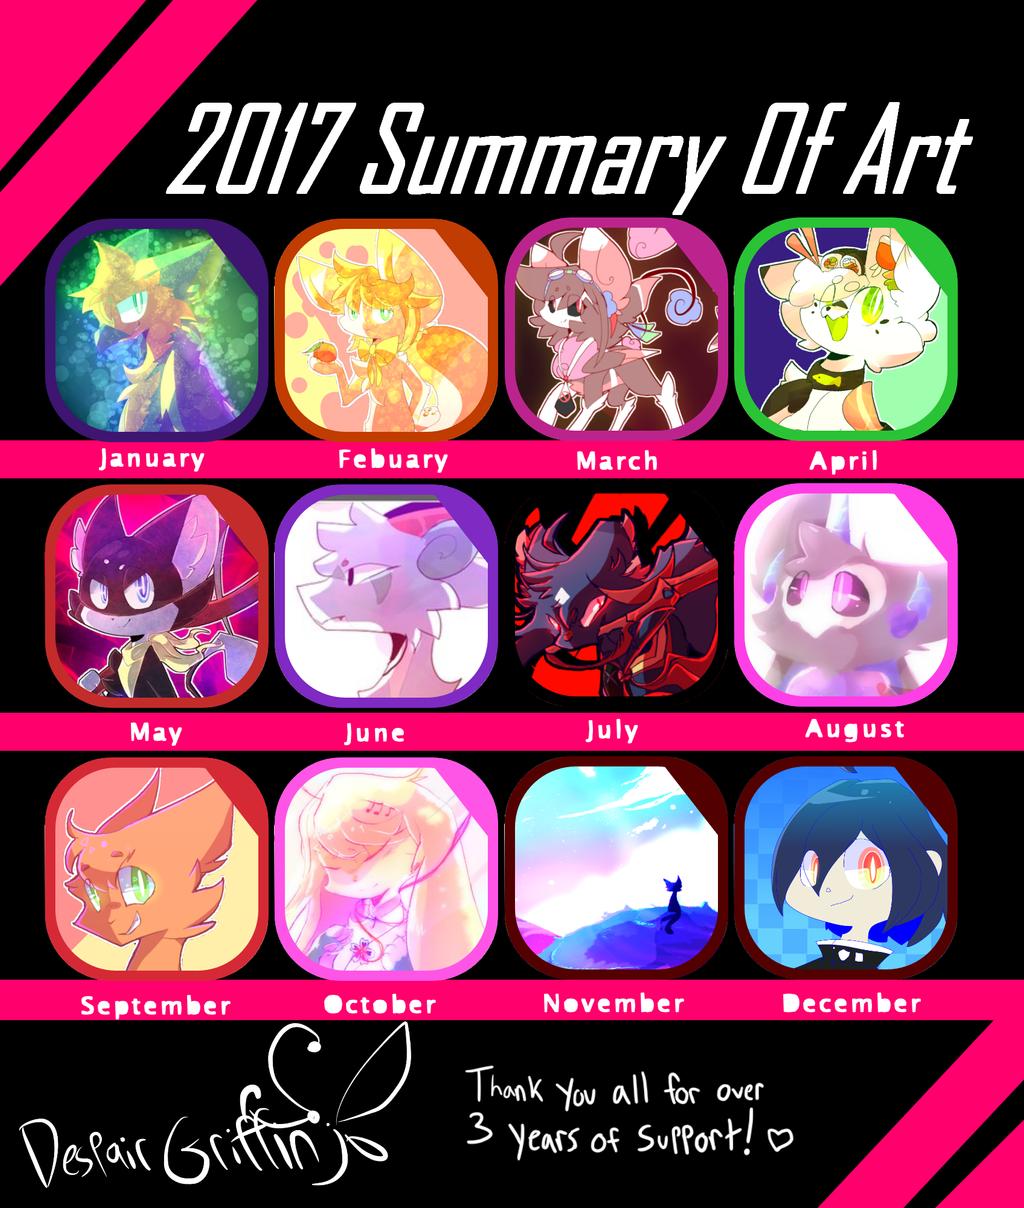 2017 Art Summary by DespairGriffin